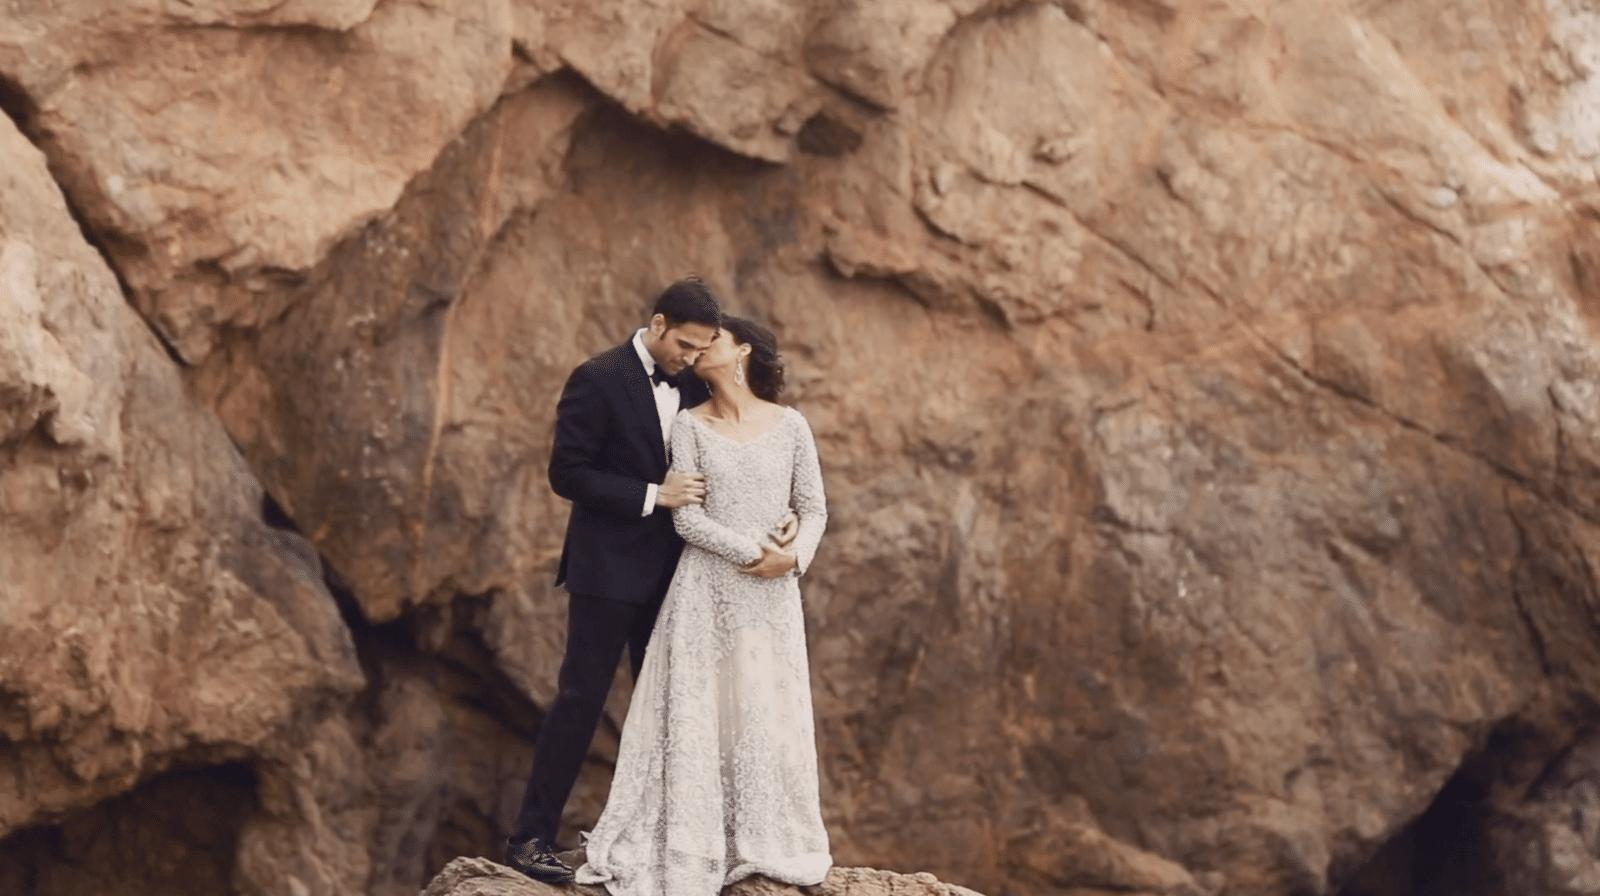 Wedding - Villa Francesca | Wedding Photography and Wedding Videography